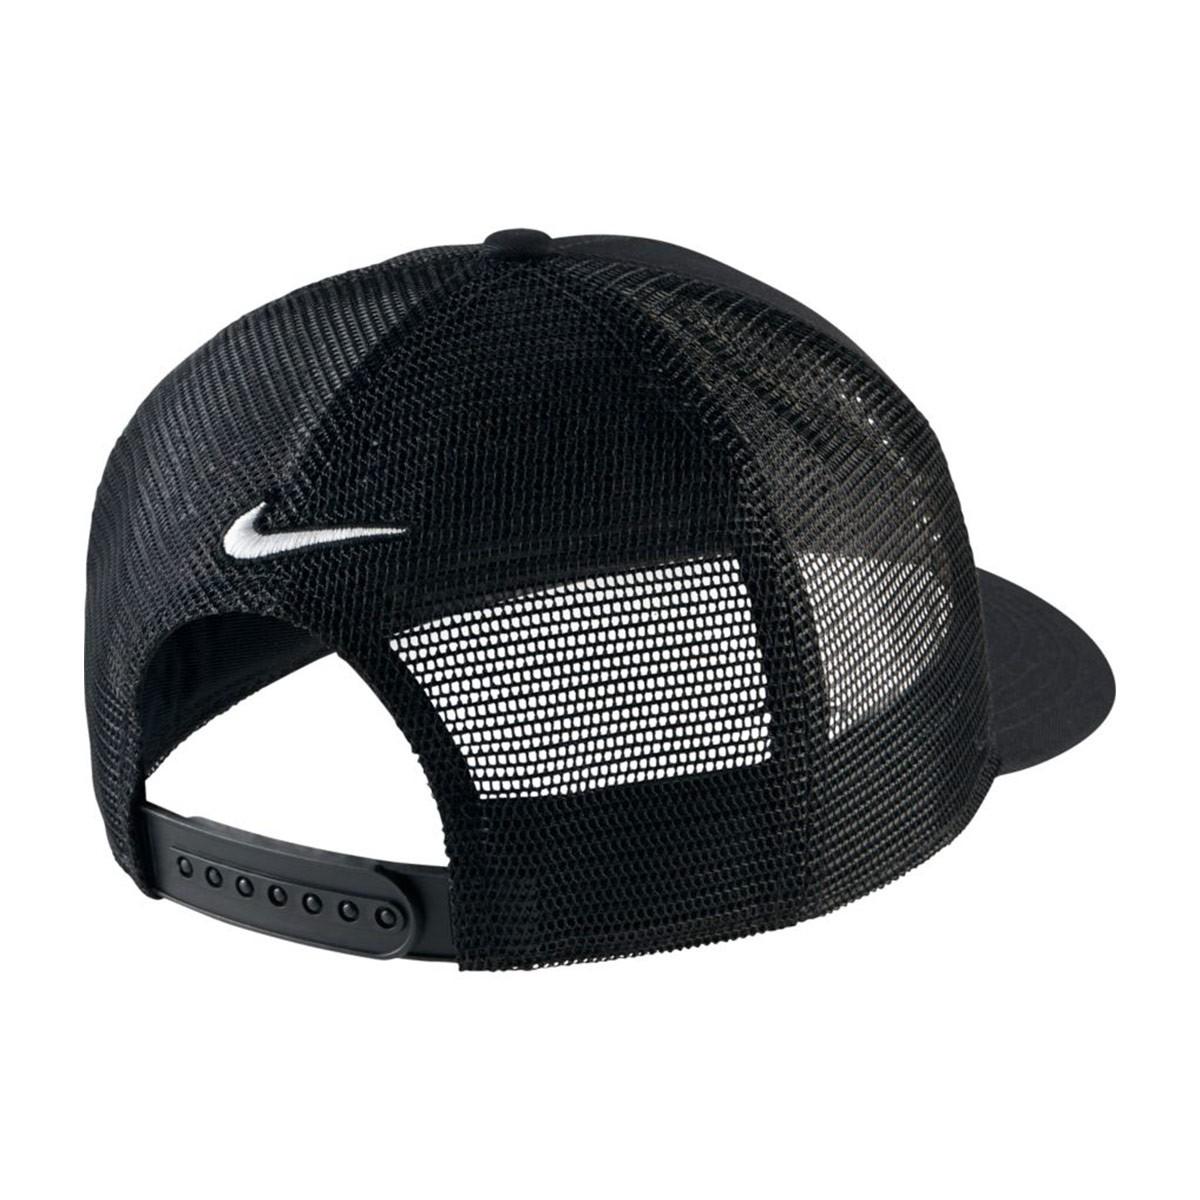 Cap Nike Nike F.C. Classic99 Black - Leaked soccer d3f1c3d06c7